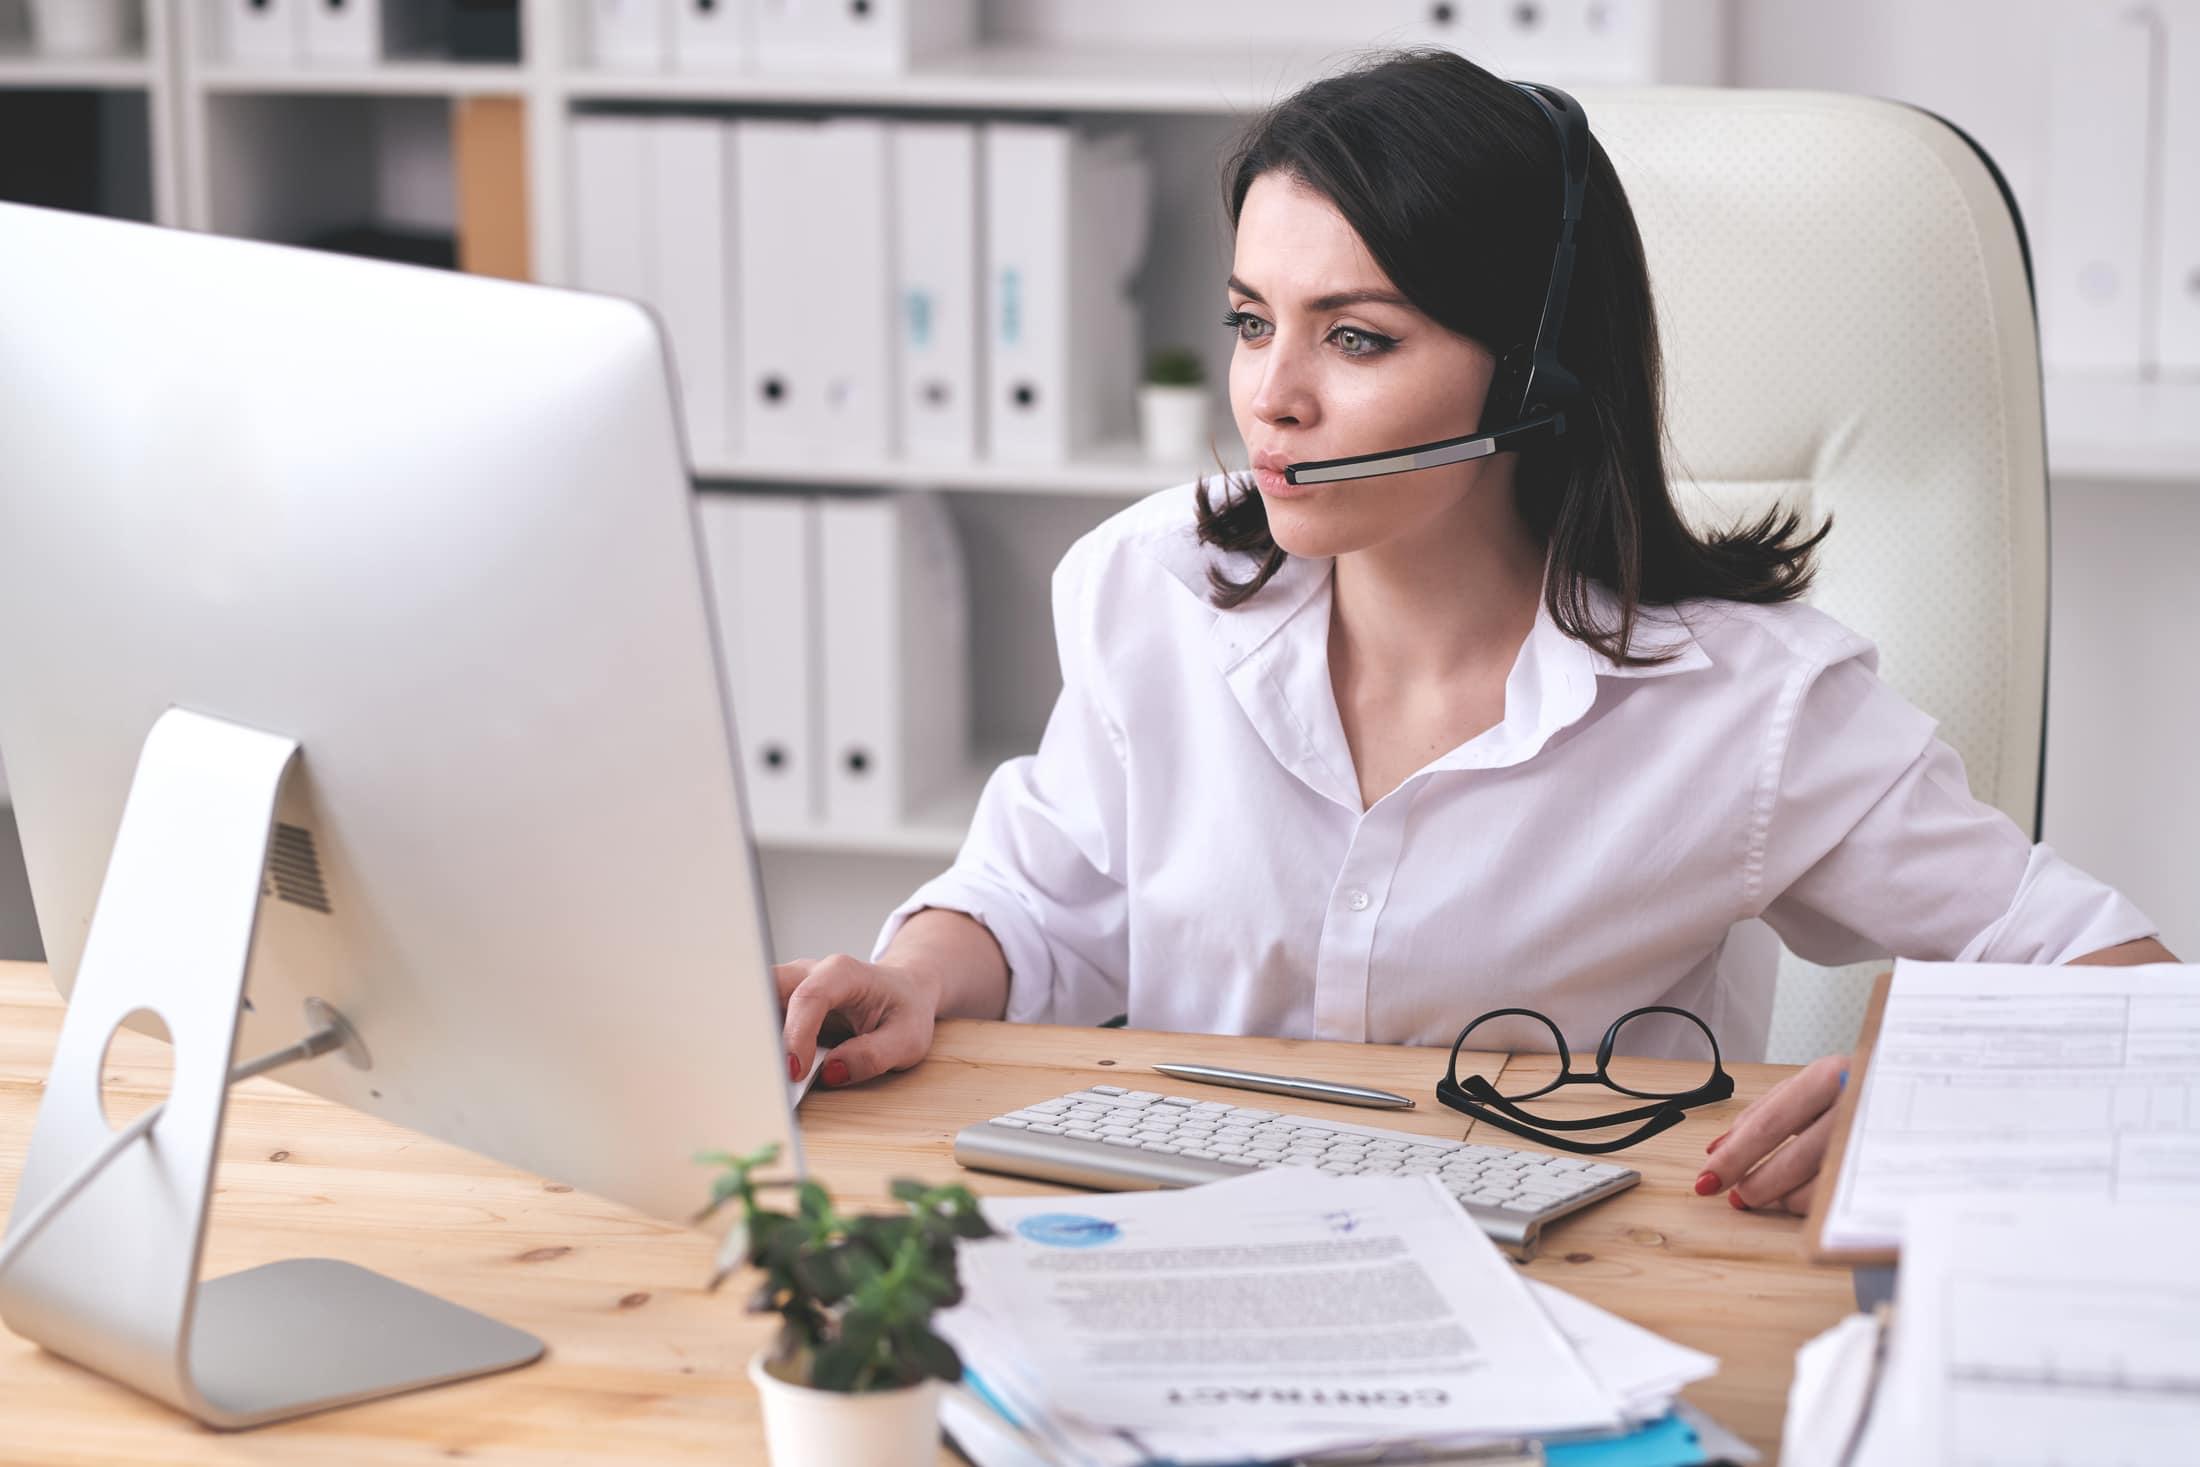 customer service operator at work 2KQHYNU